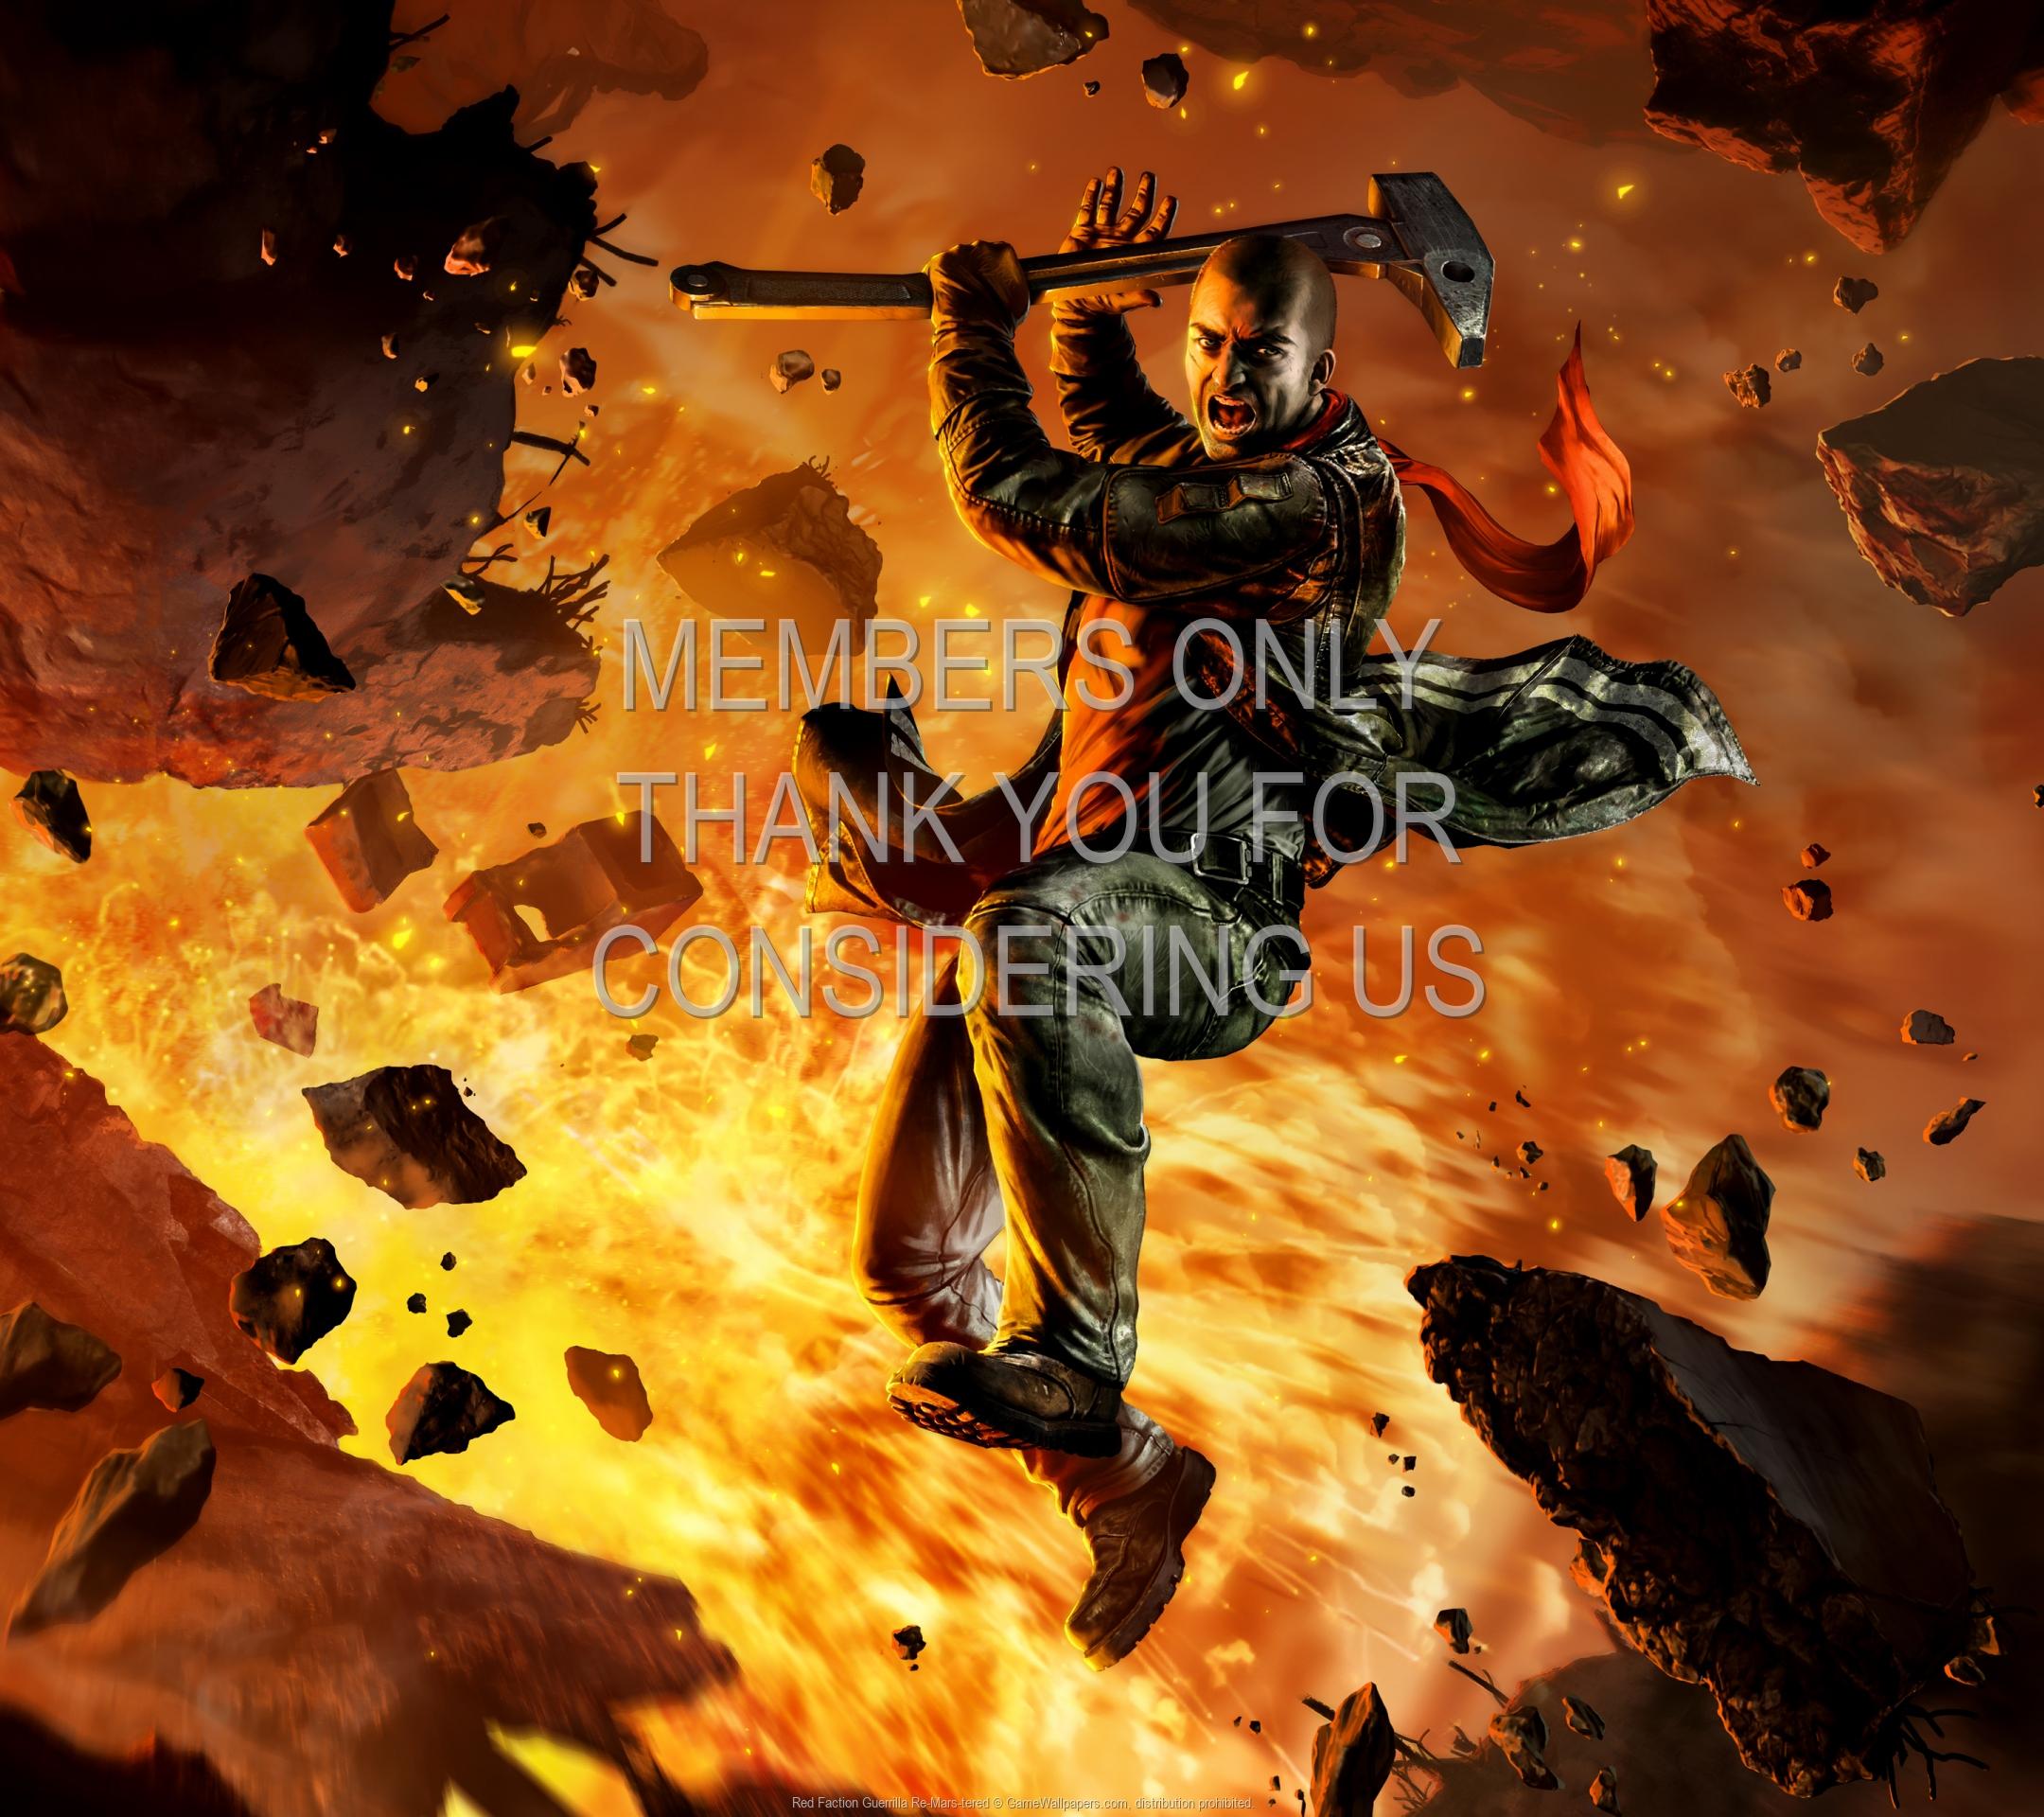 Red Faction: Guerrilla Re-Mars-tered 1920x1080 Mobile fond d'écran 01